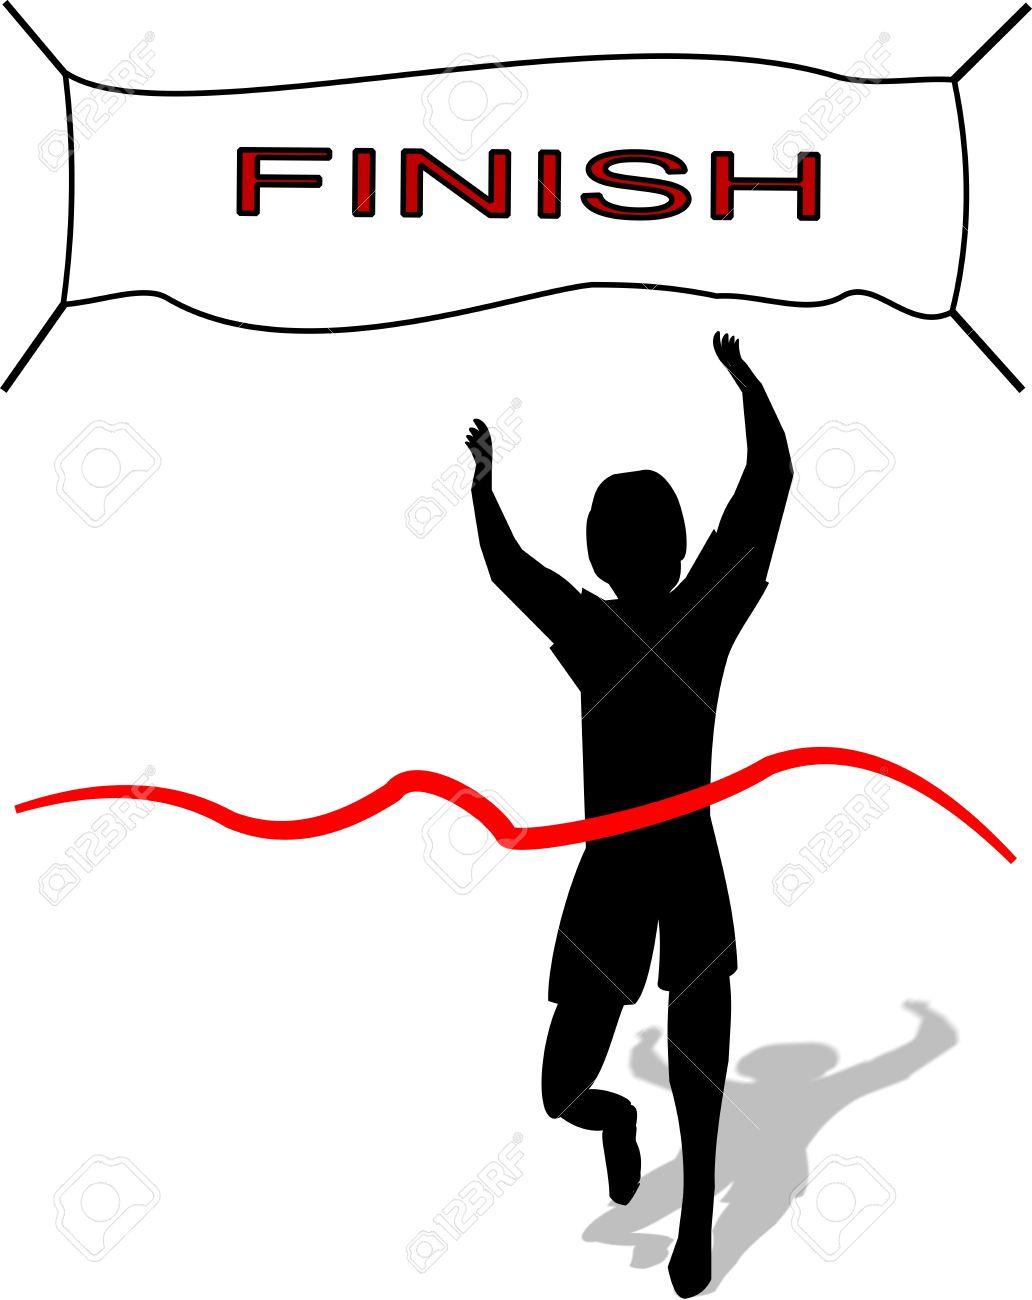 1032x1300 Winning Clipart Finish Line